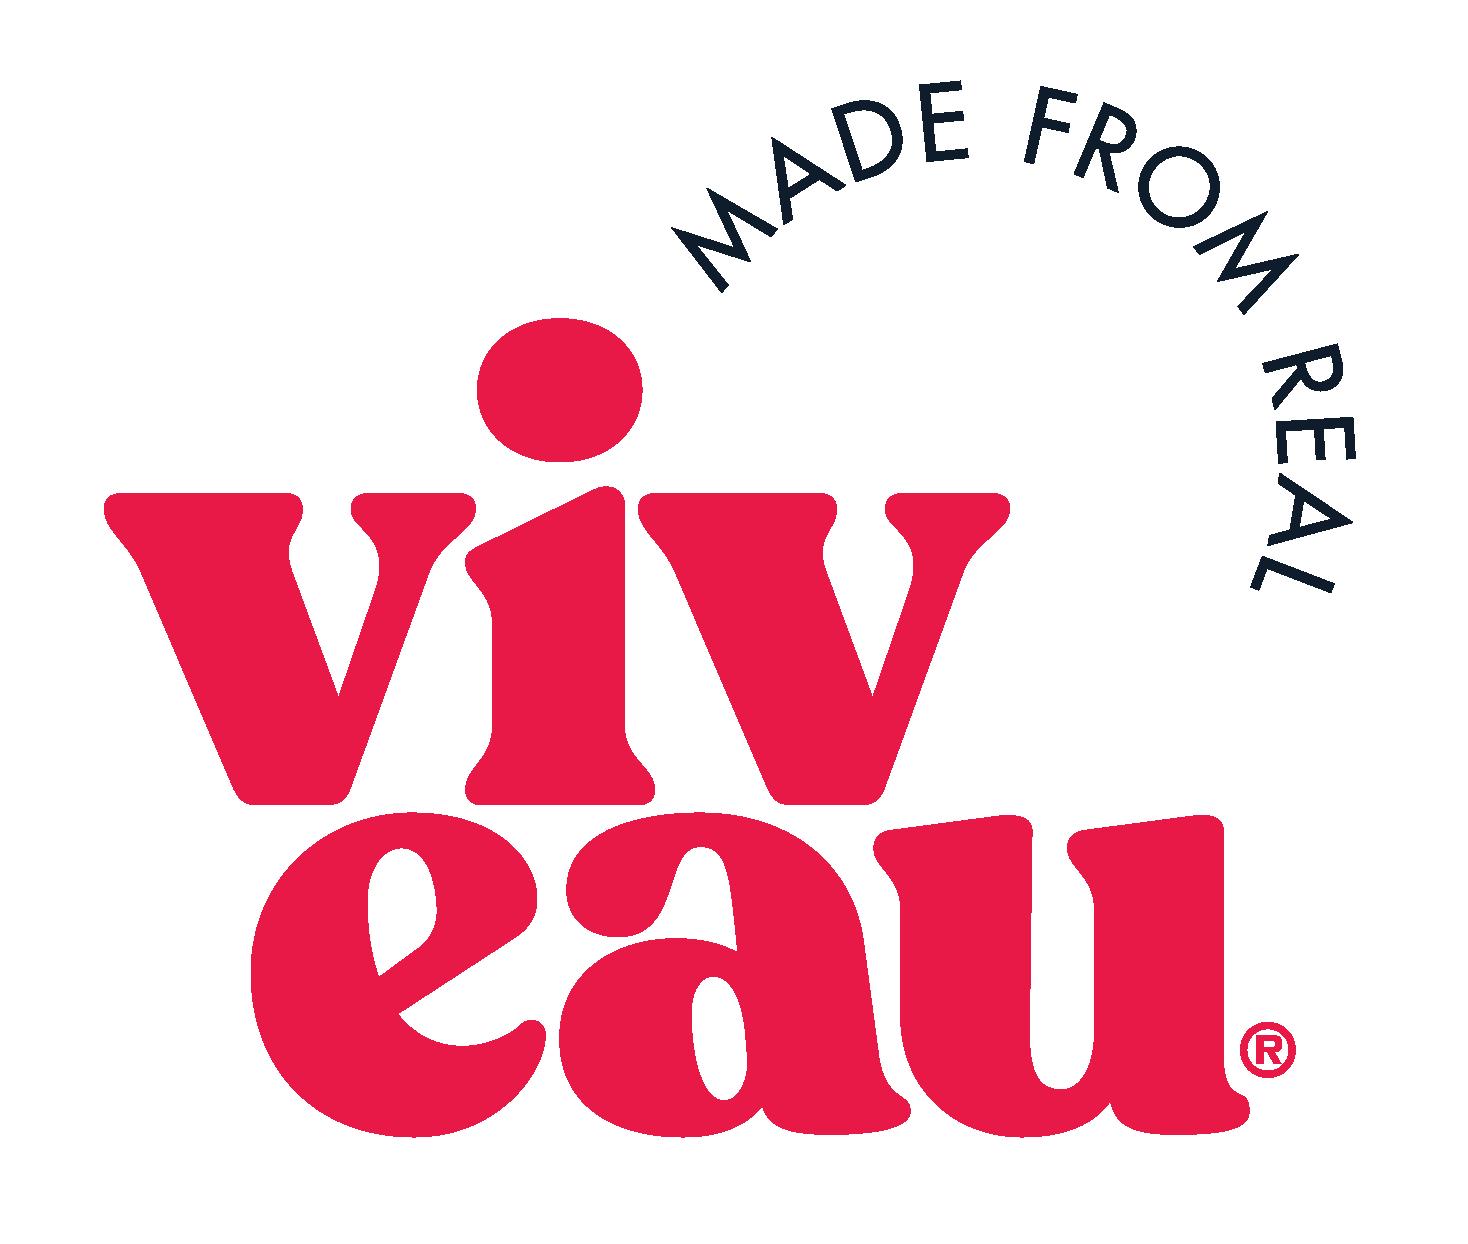 Viveau logo